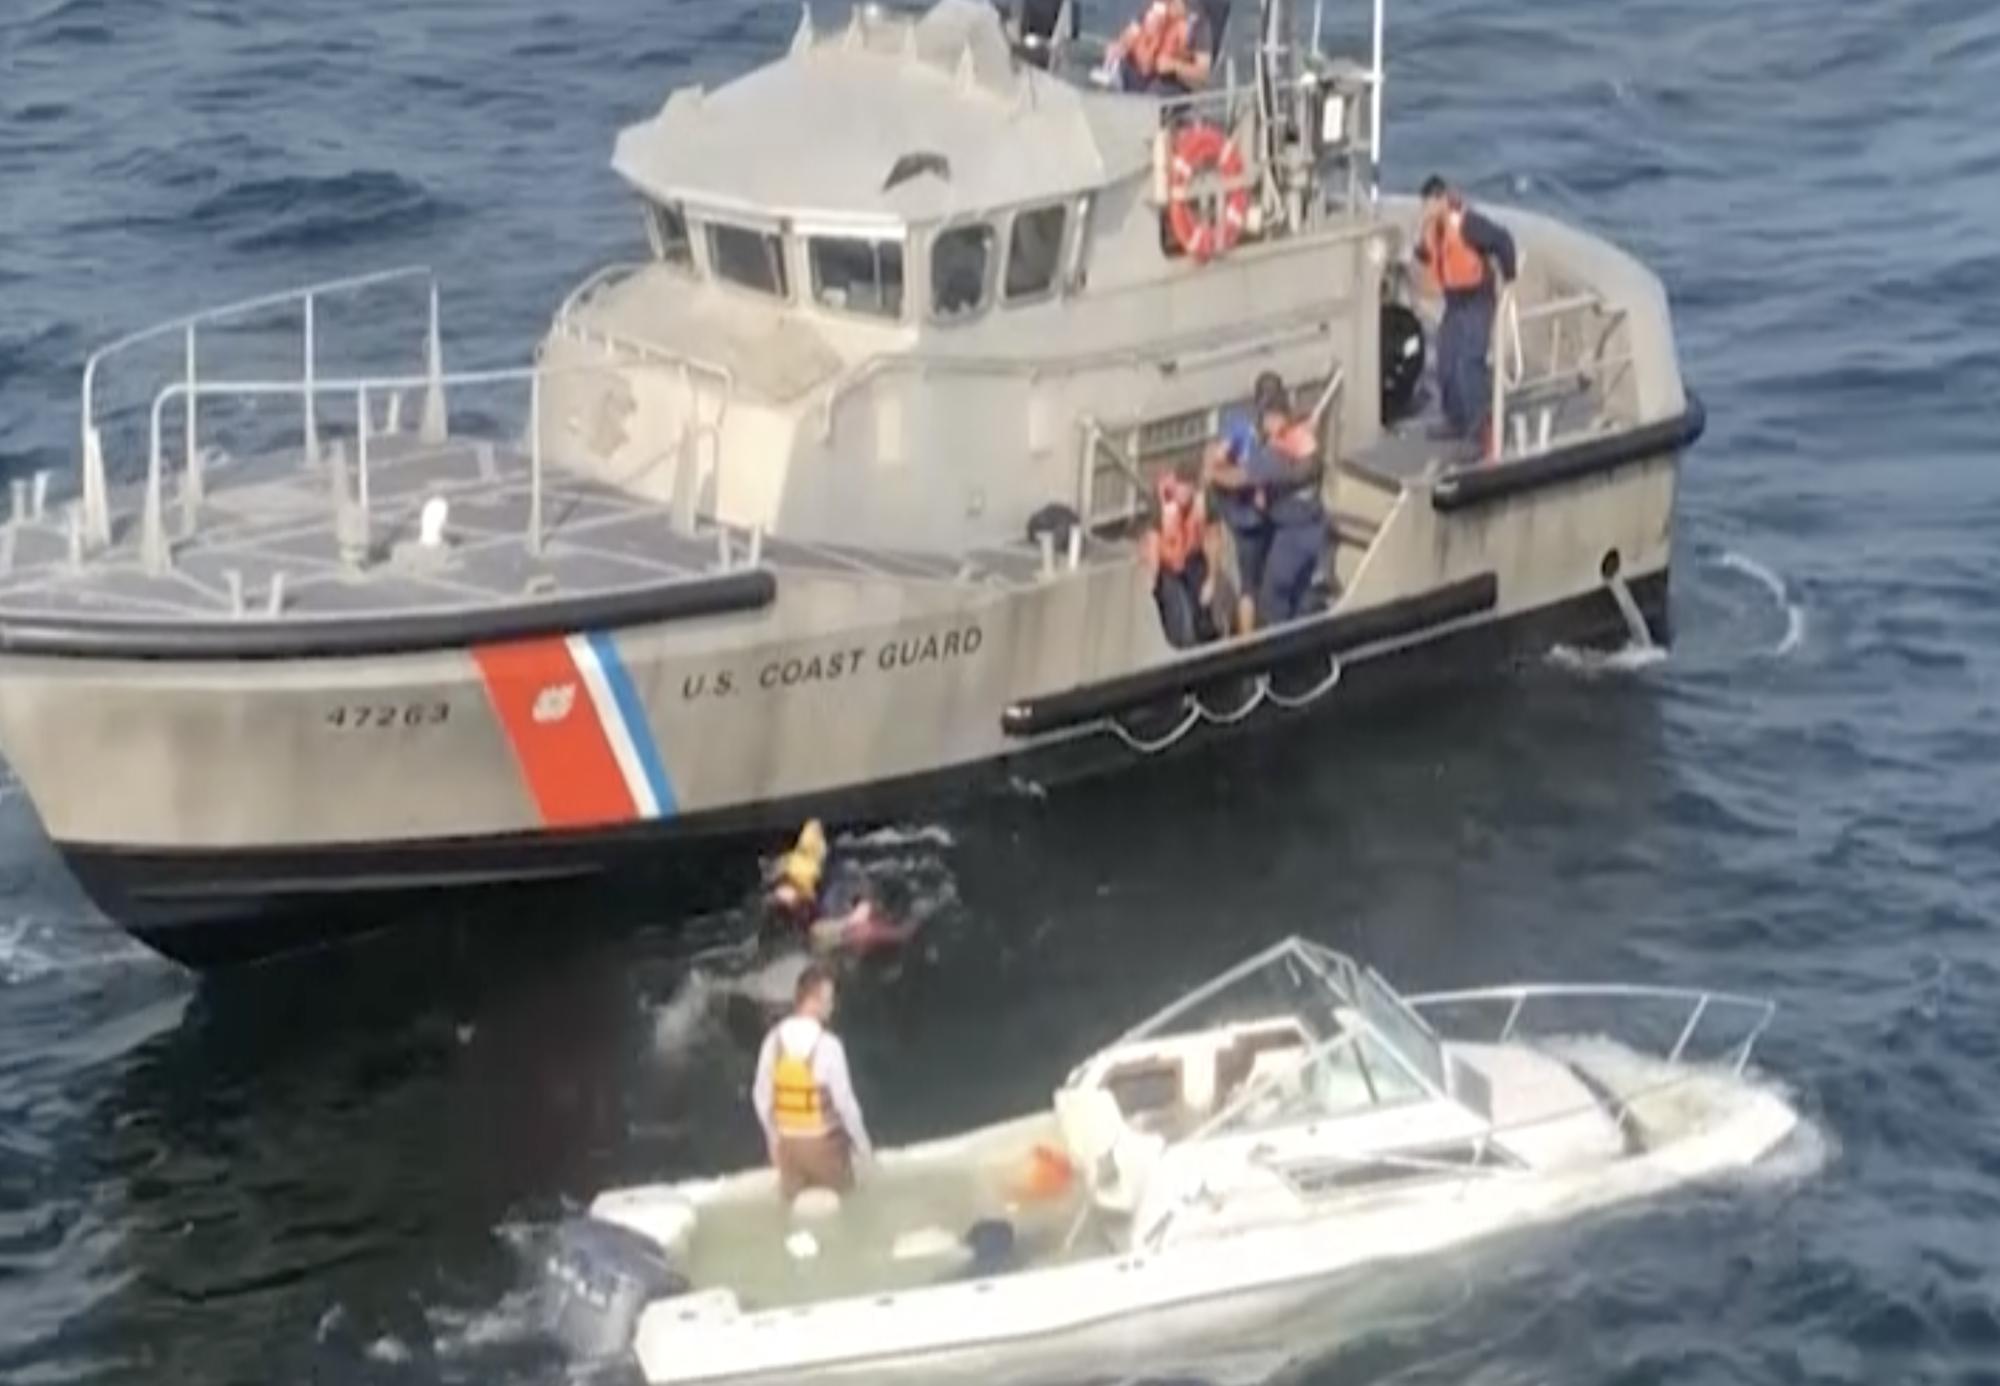 Coast Guard rescues 3 from sinking vessel near Long Brand, New Jersey